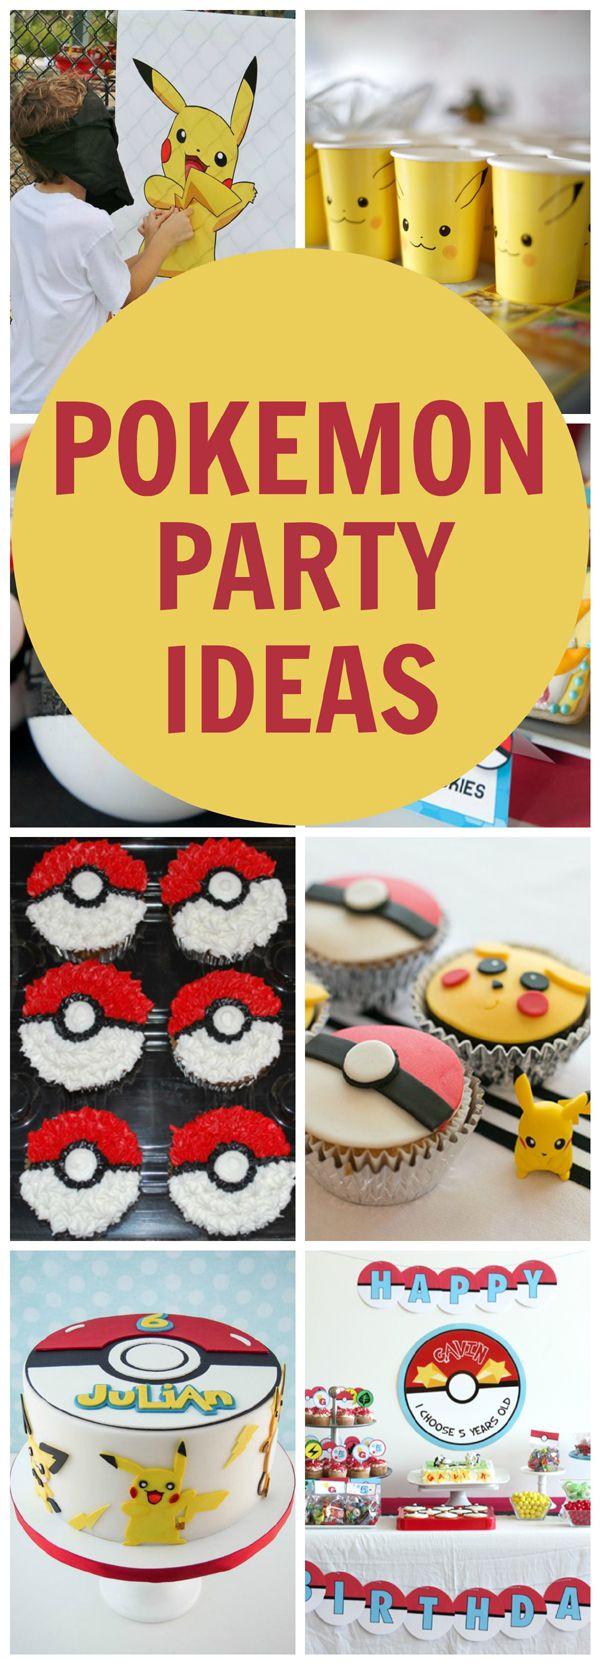 Creative Pokemon Birthday Party Ideas via Pretty My Party                                                                                                                                                                                 More